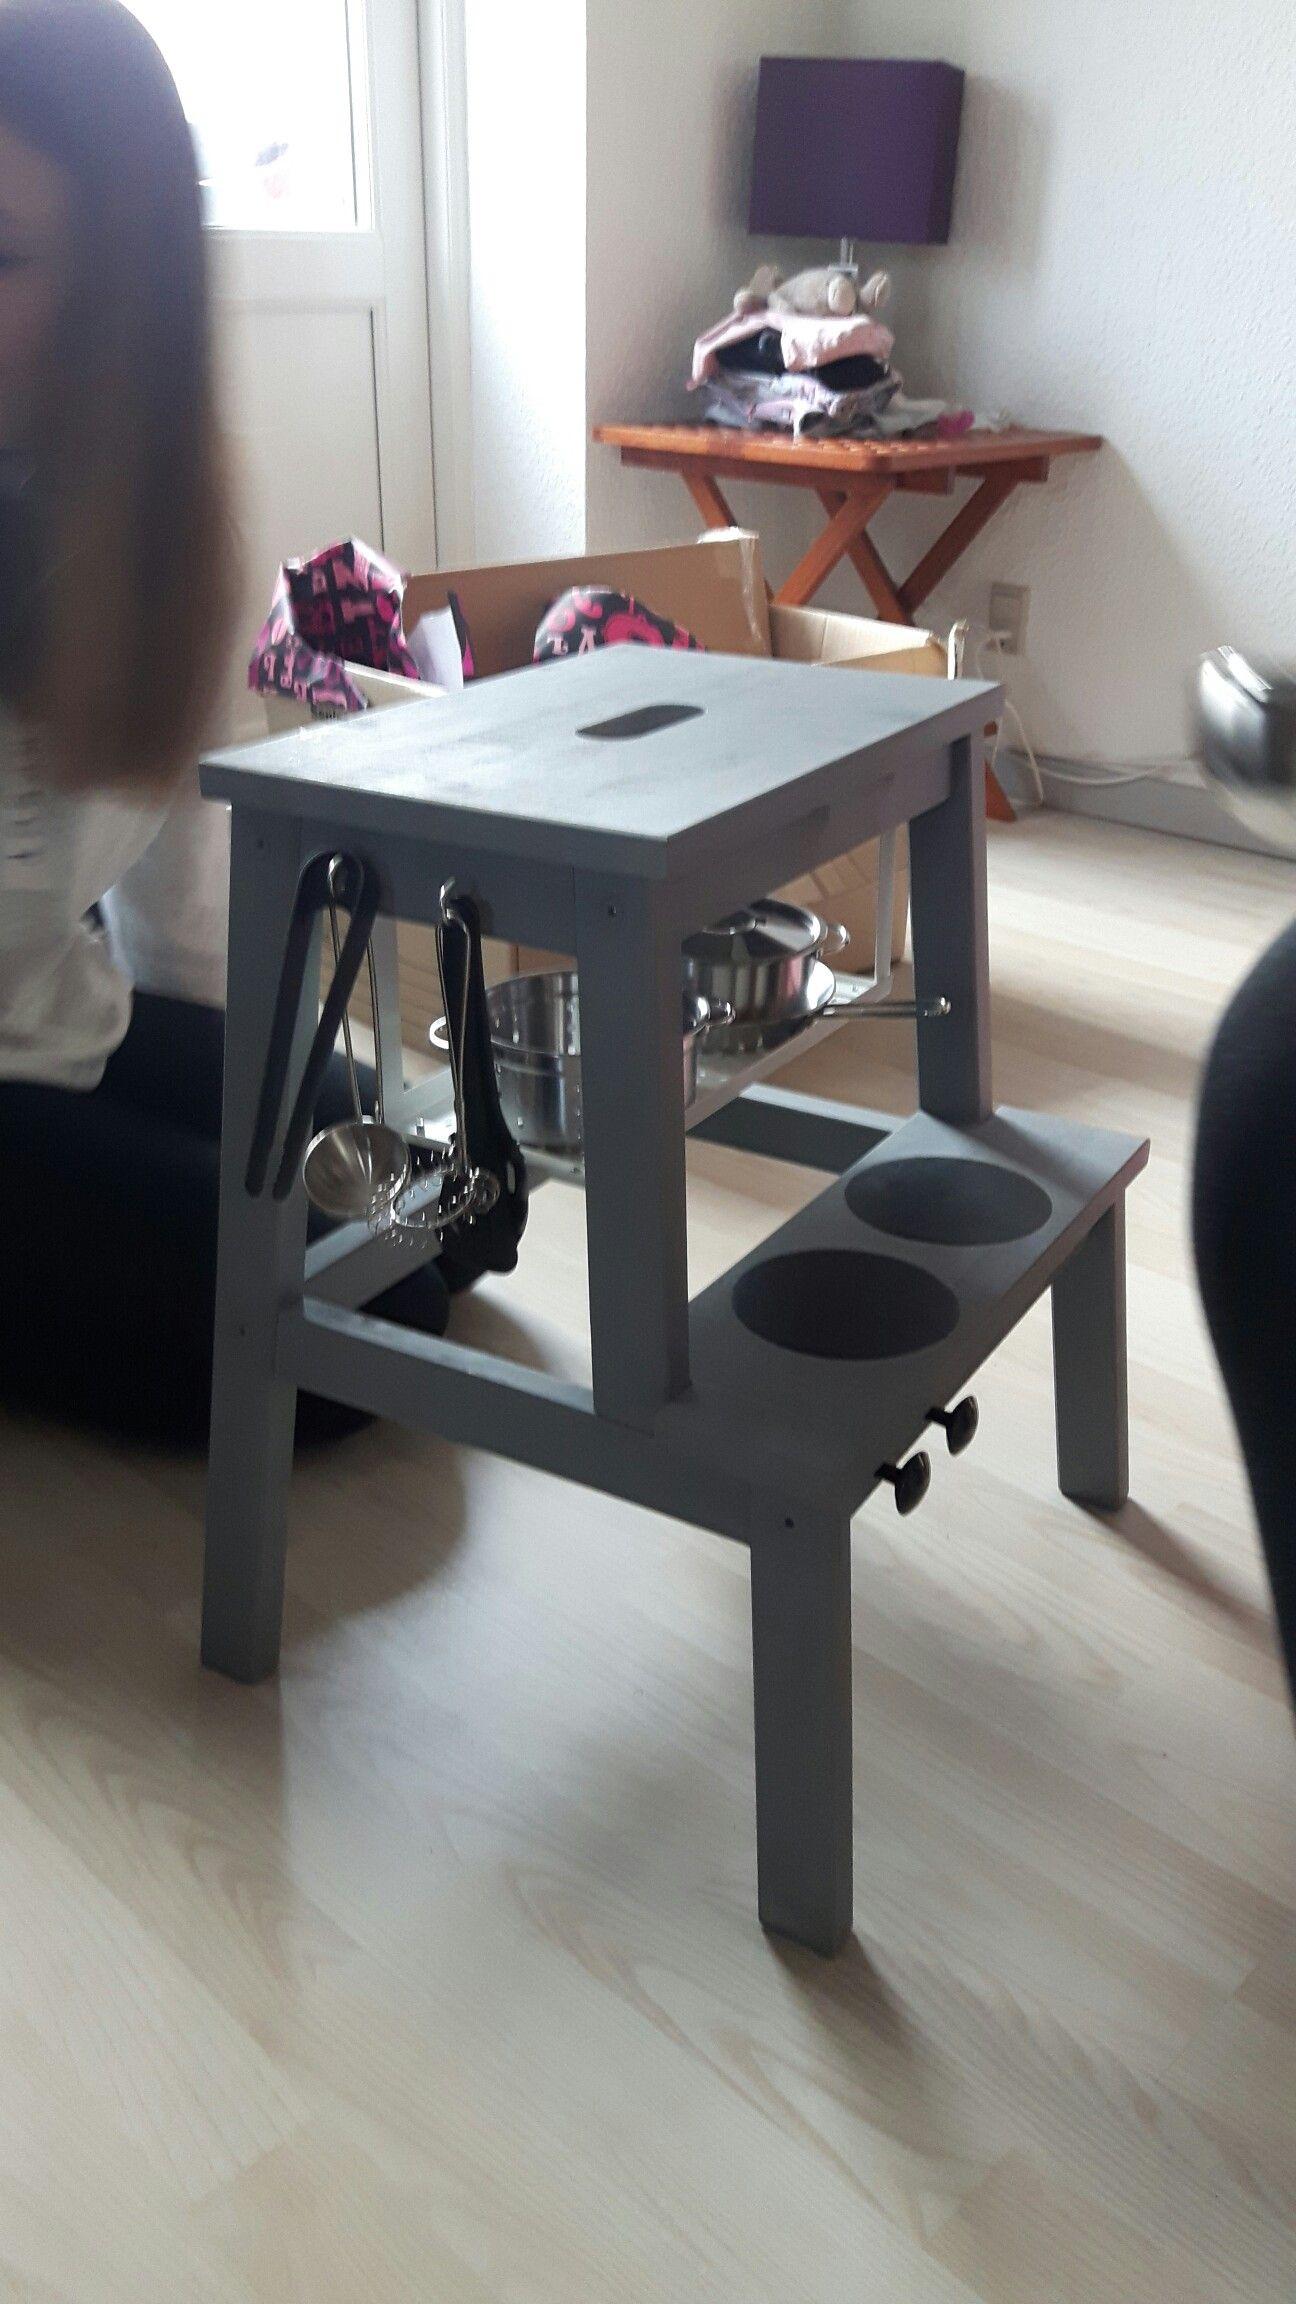 Legekøkken til min lille niece. Skammel malet og monteret med knopper og kroge og en lille hylde.